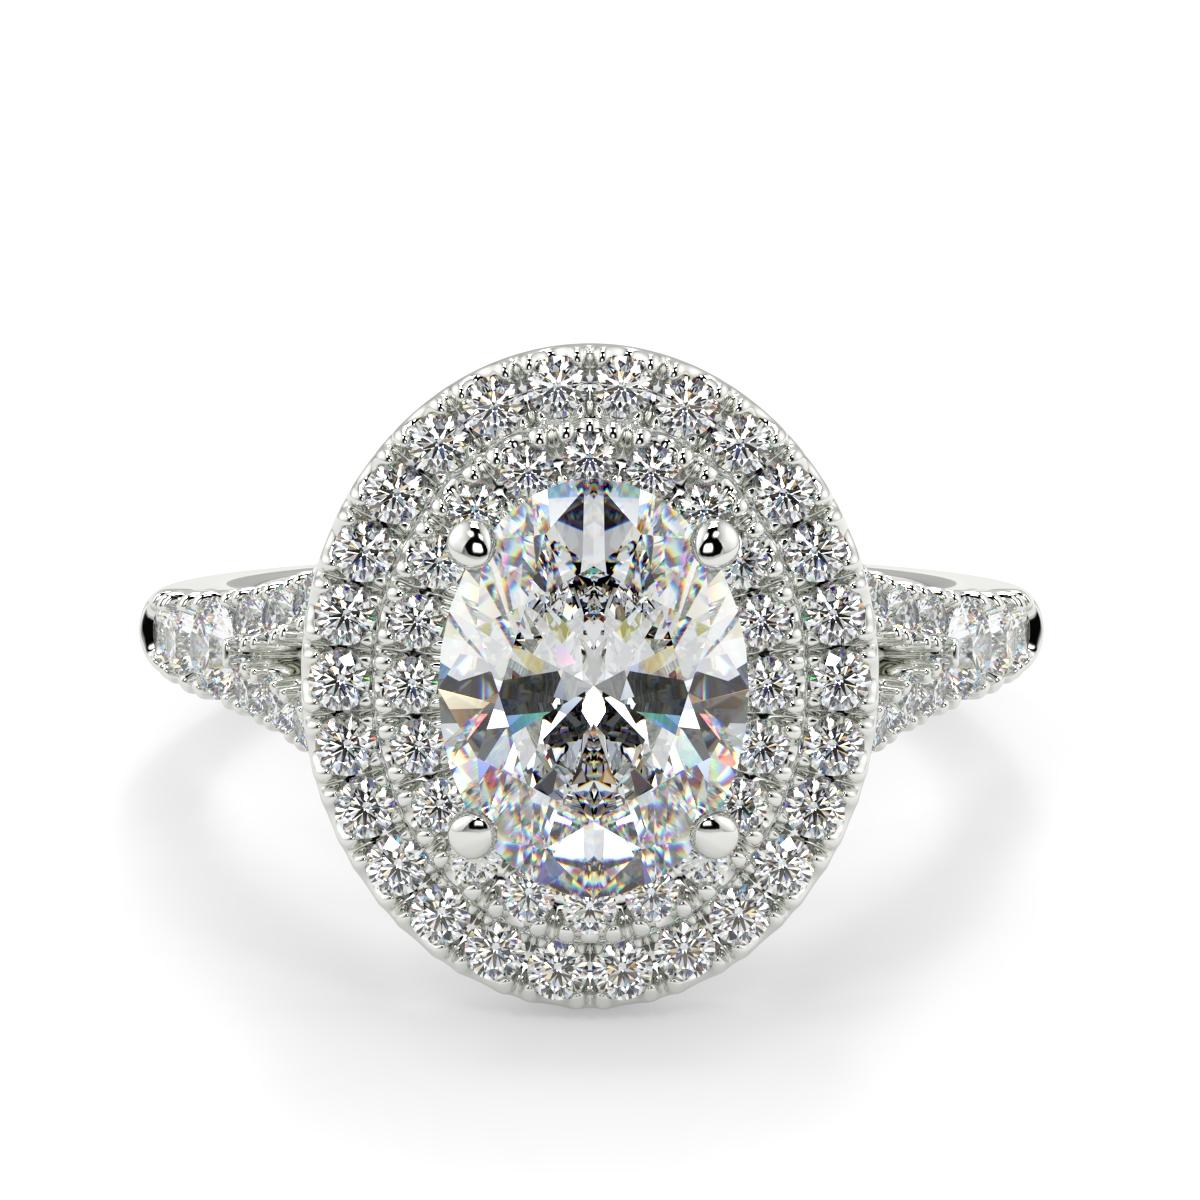 Oval Microset Double Halo Diamond Ring